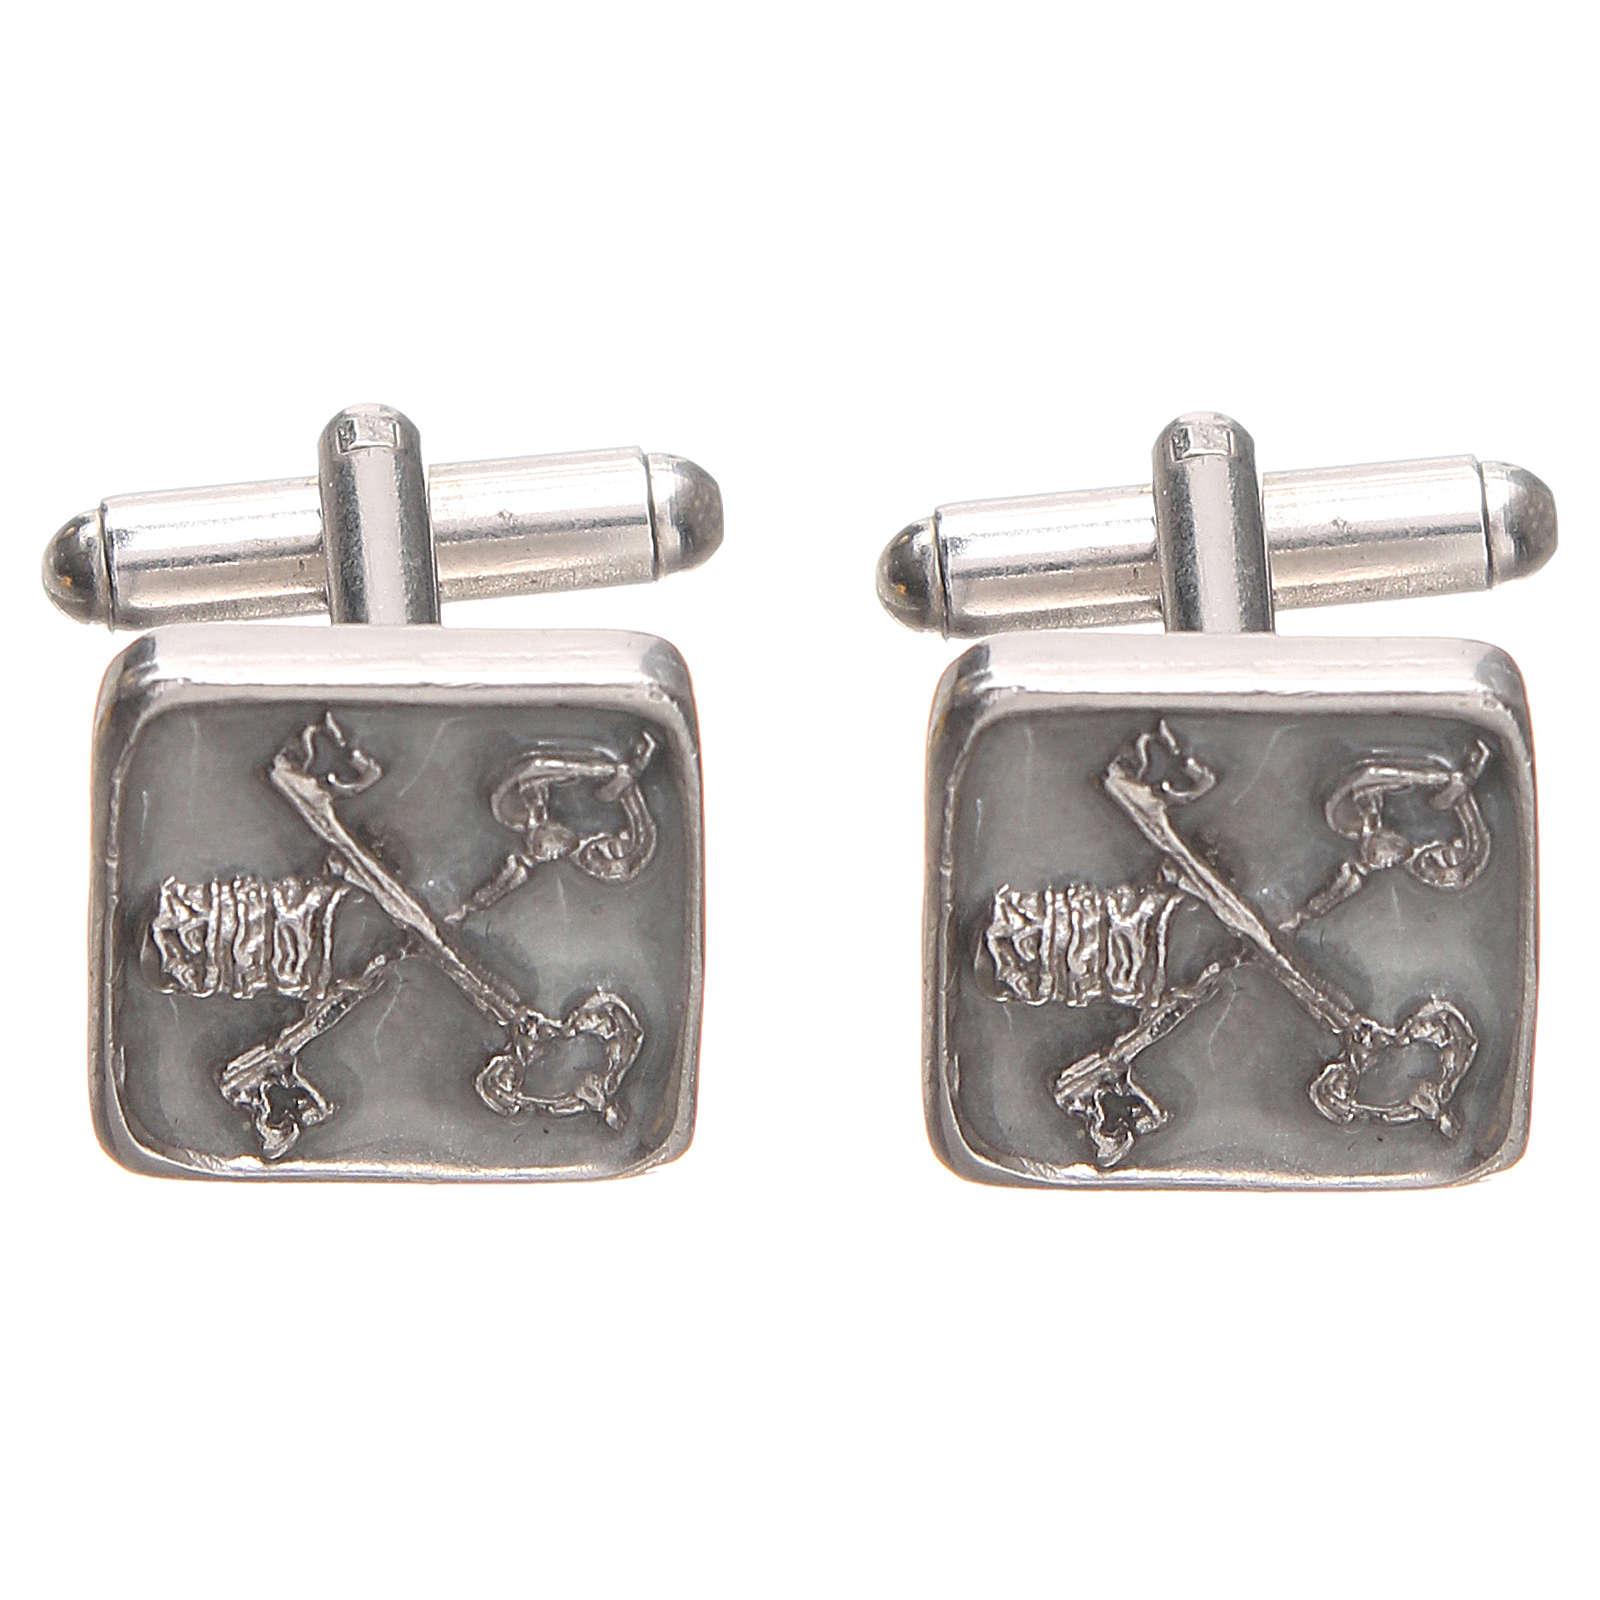 Mancuernillas de pulsera plata 800 Llaves Vaticano 1,5x1,5 cm 4